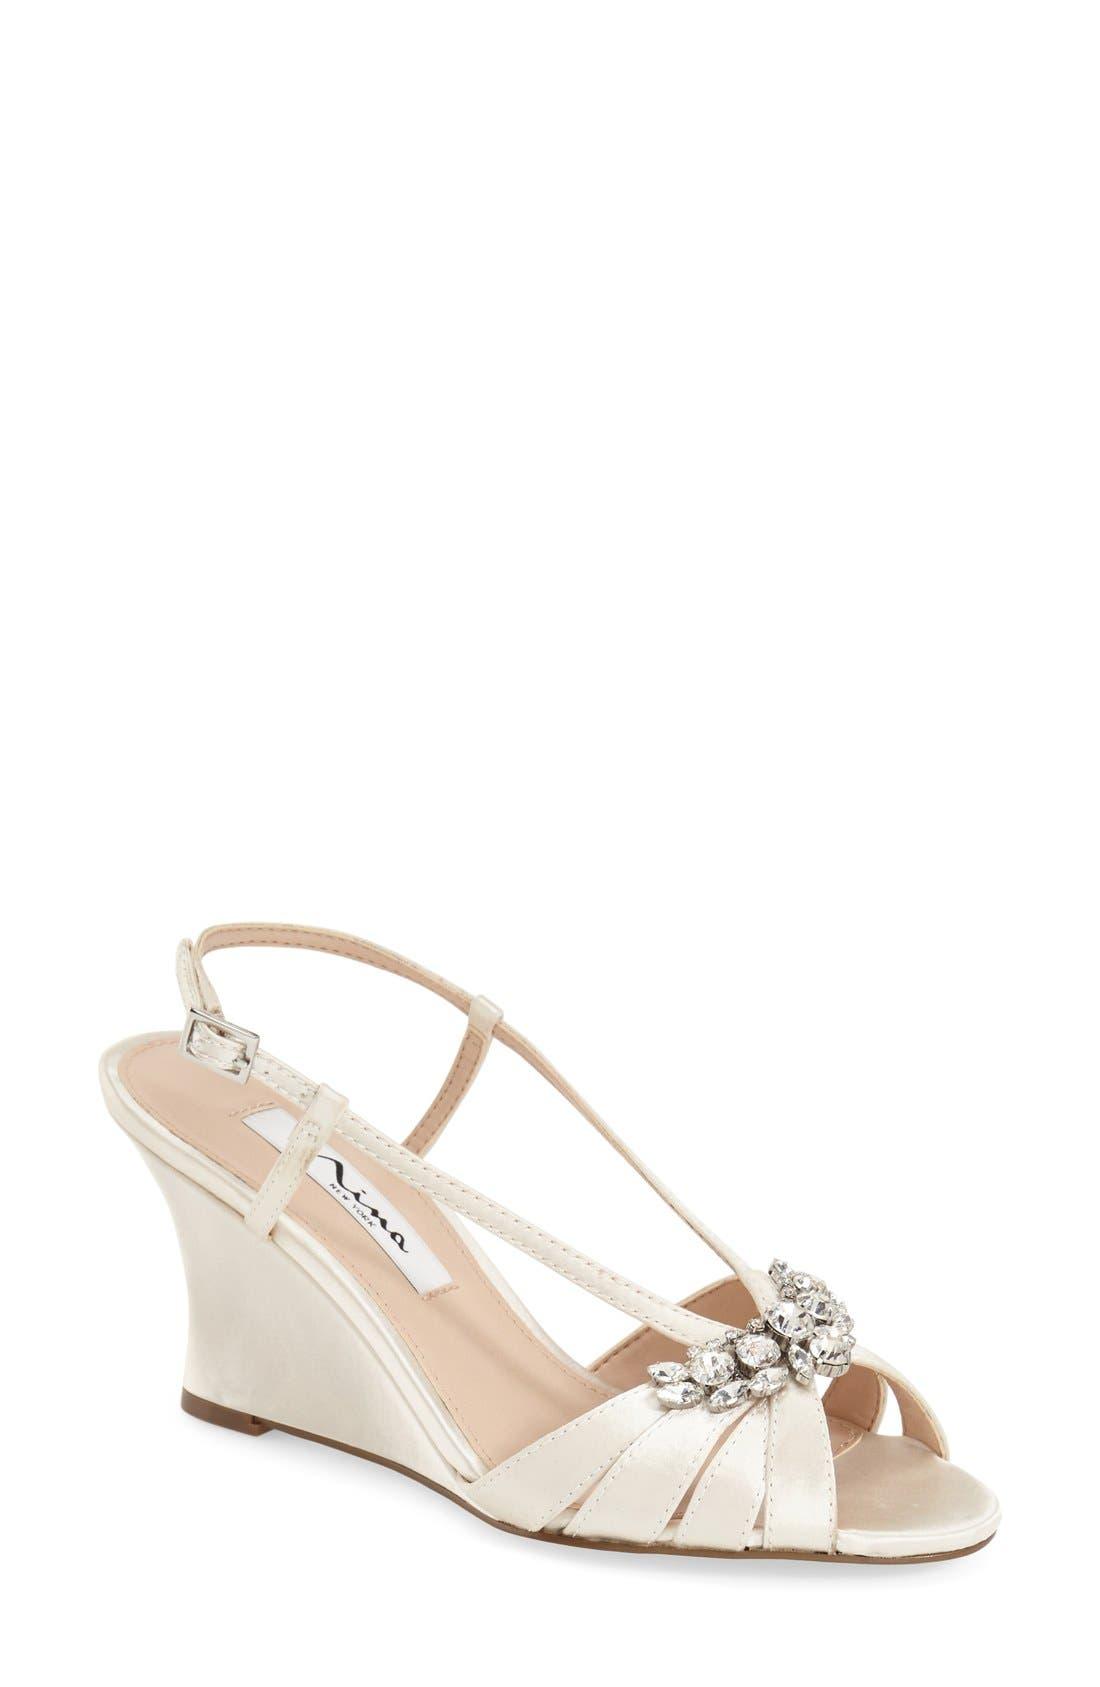 'Voleta' Wedge Sandal,                         Main,                         color, 900